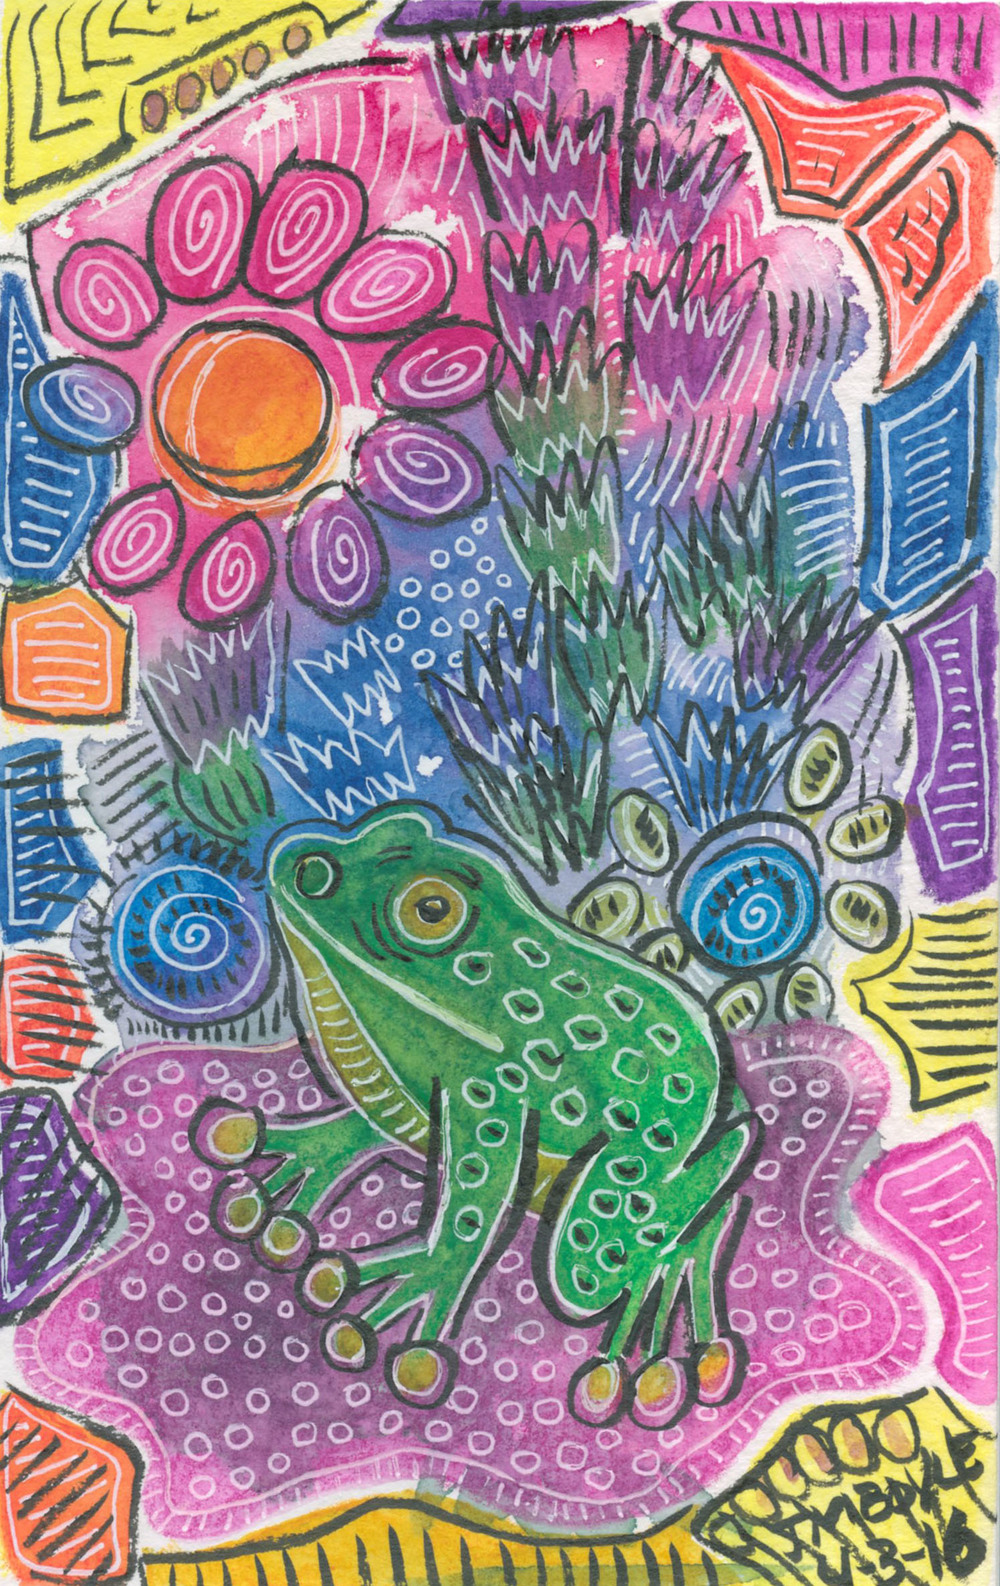 doodle_frog.jpg